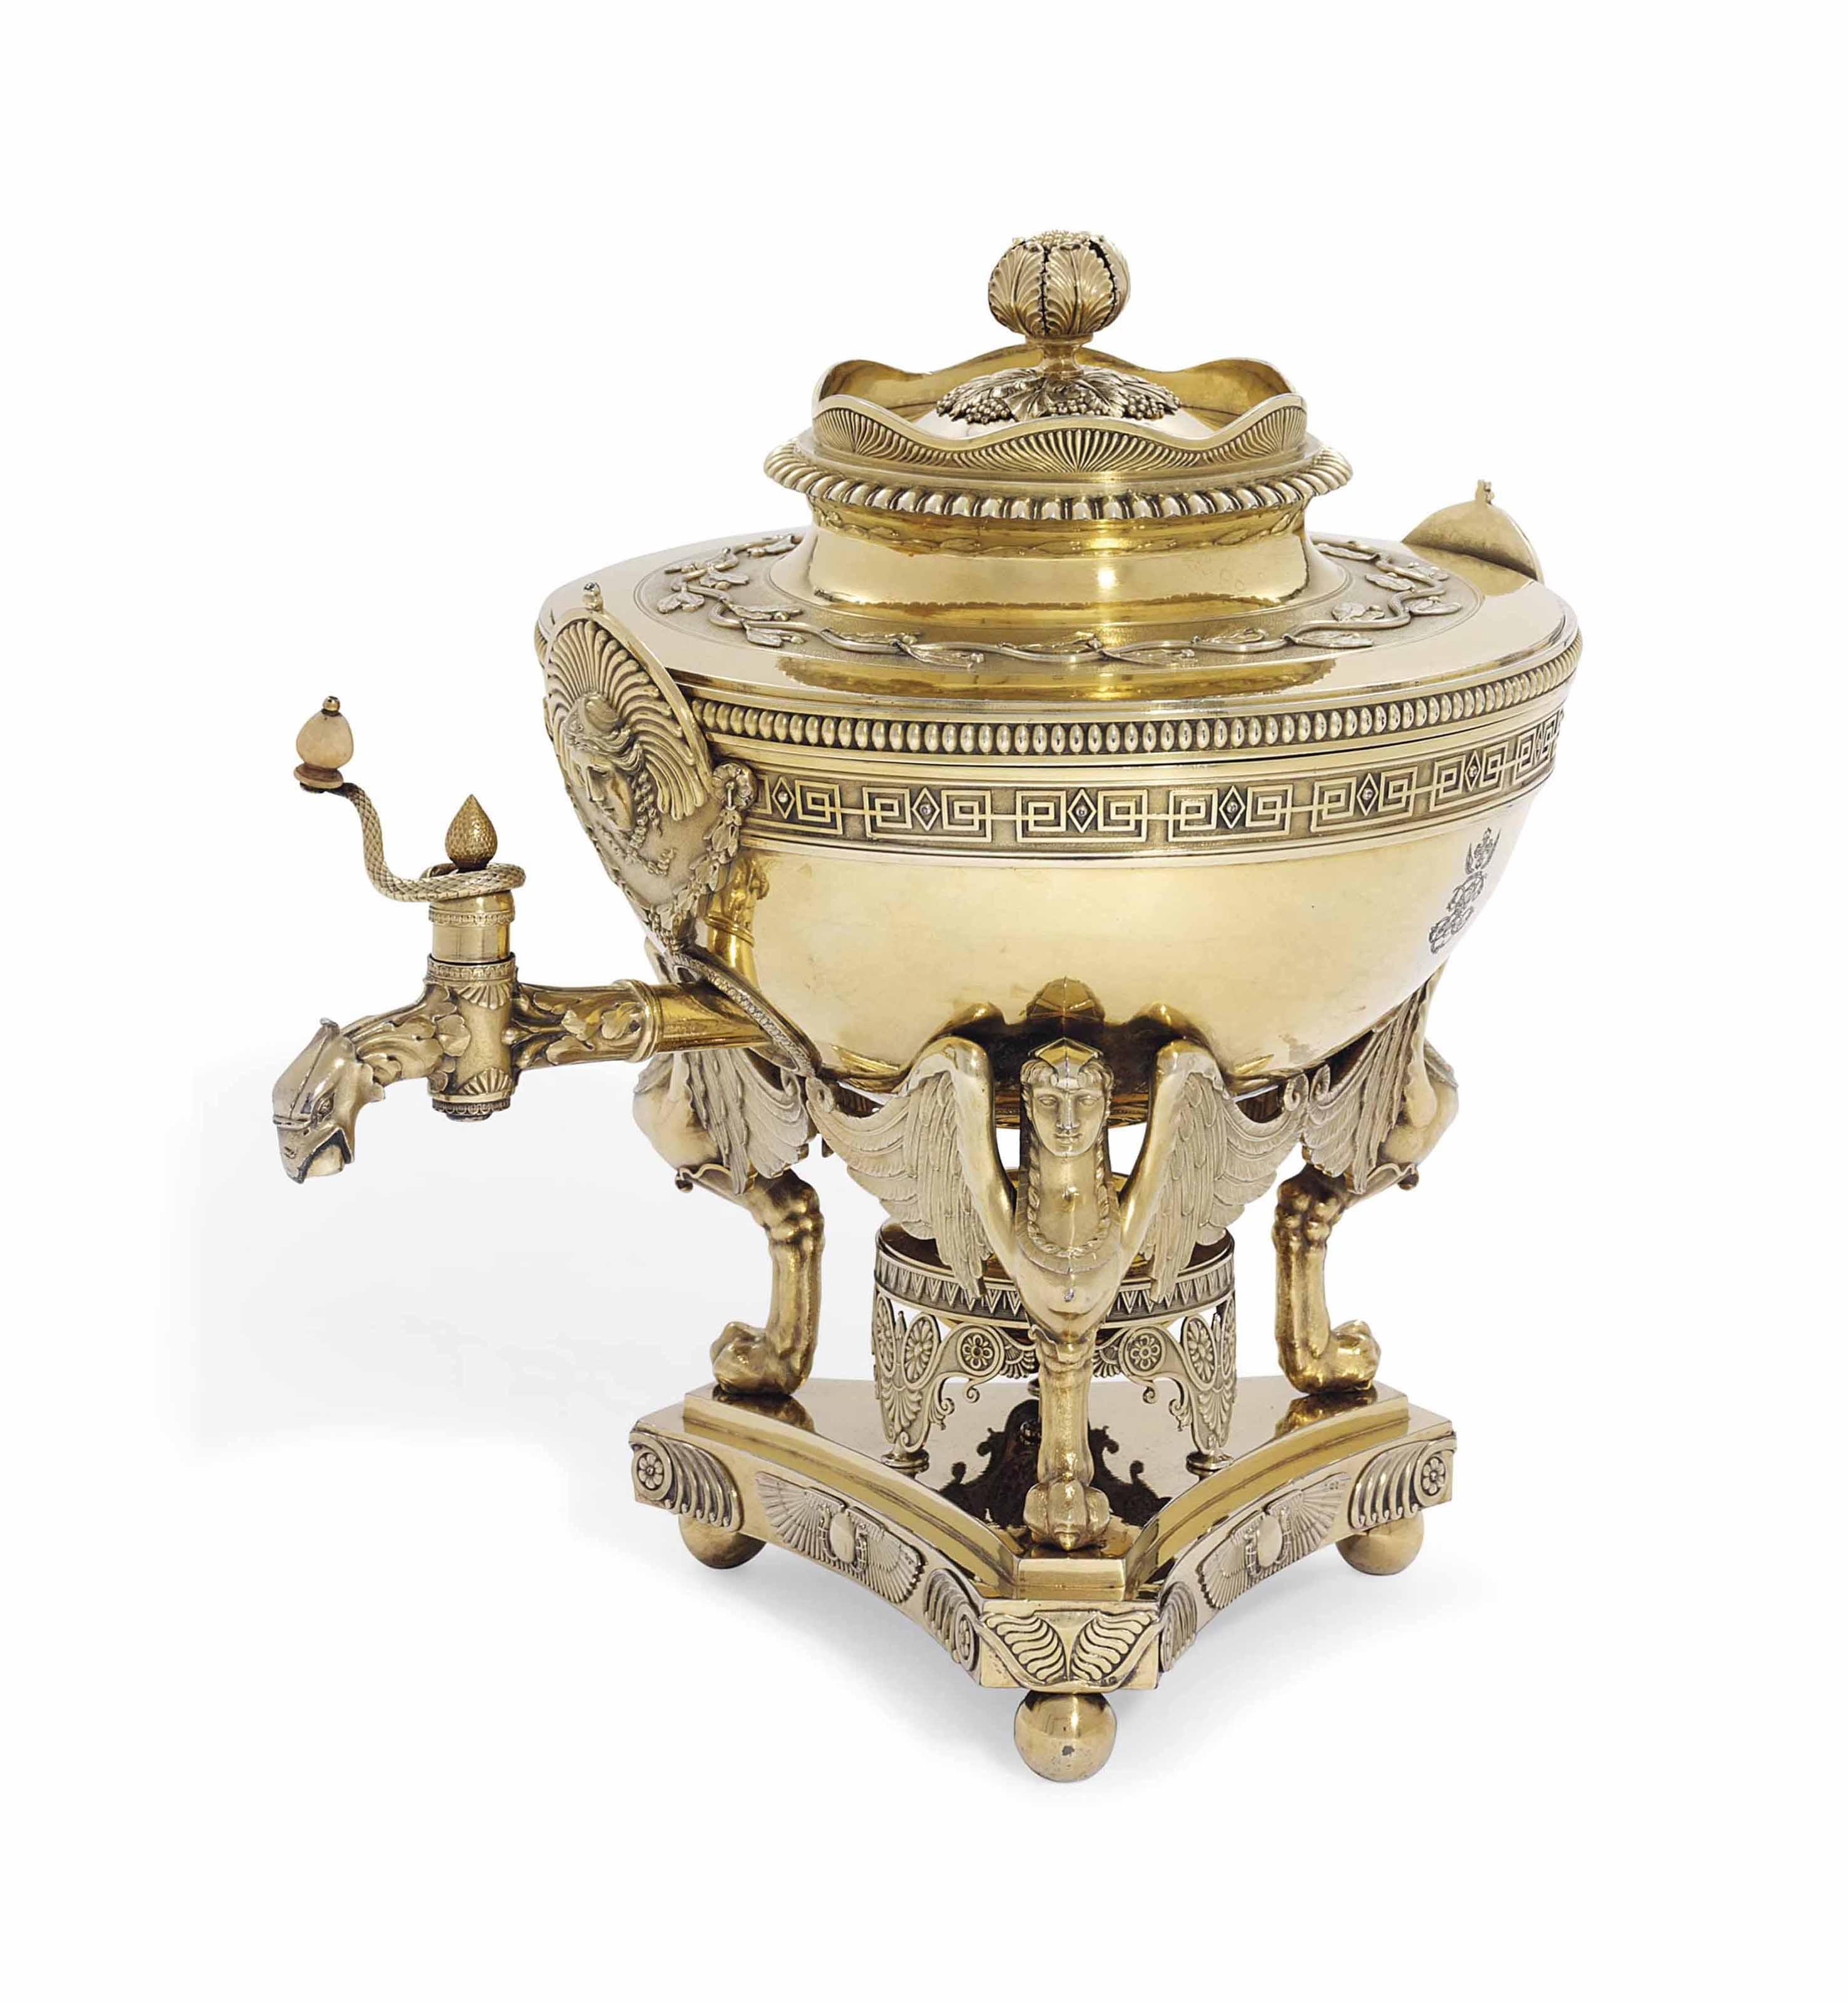 A GEORGE III SILVER-GILT TEA-U